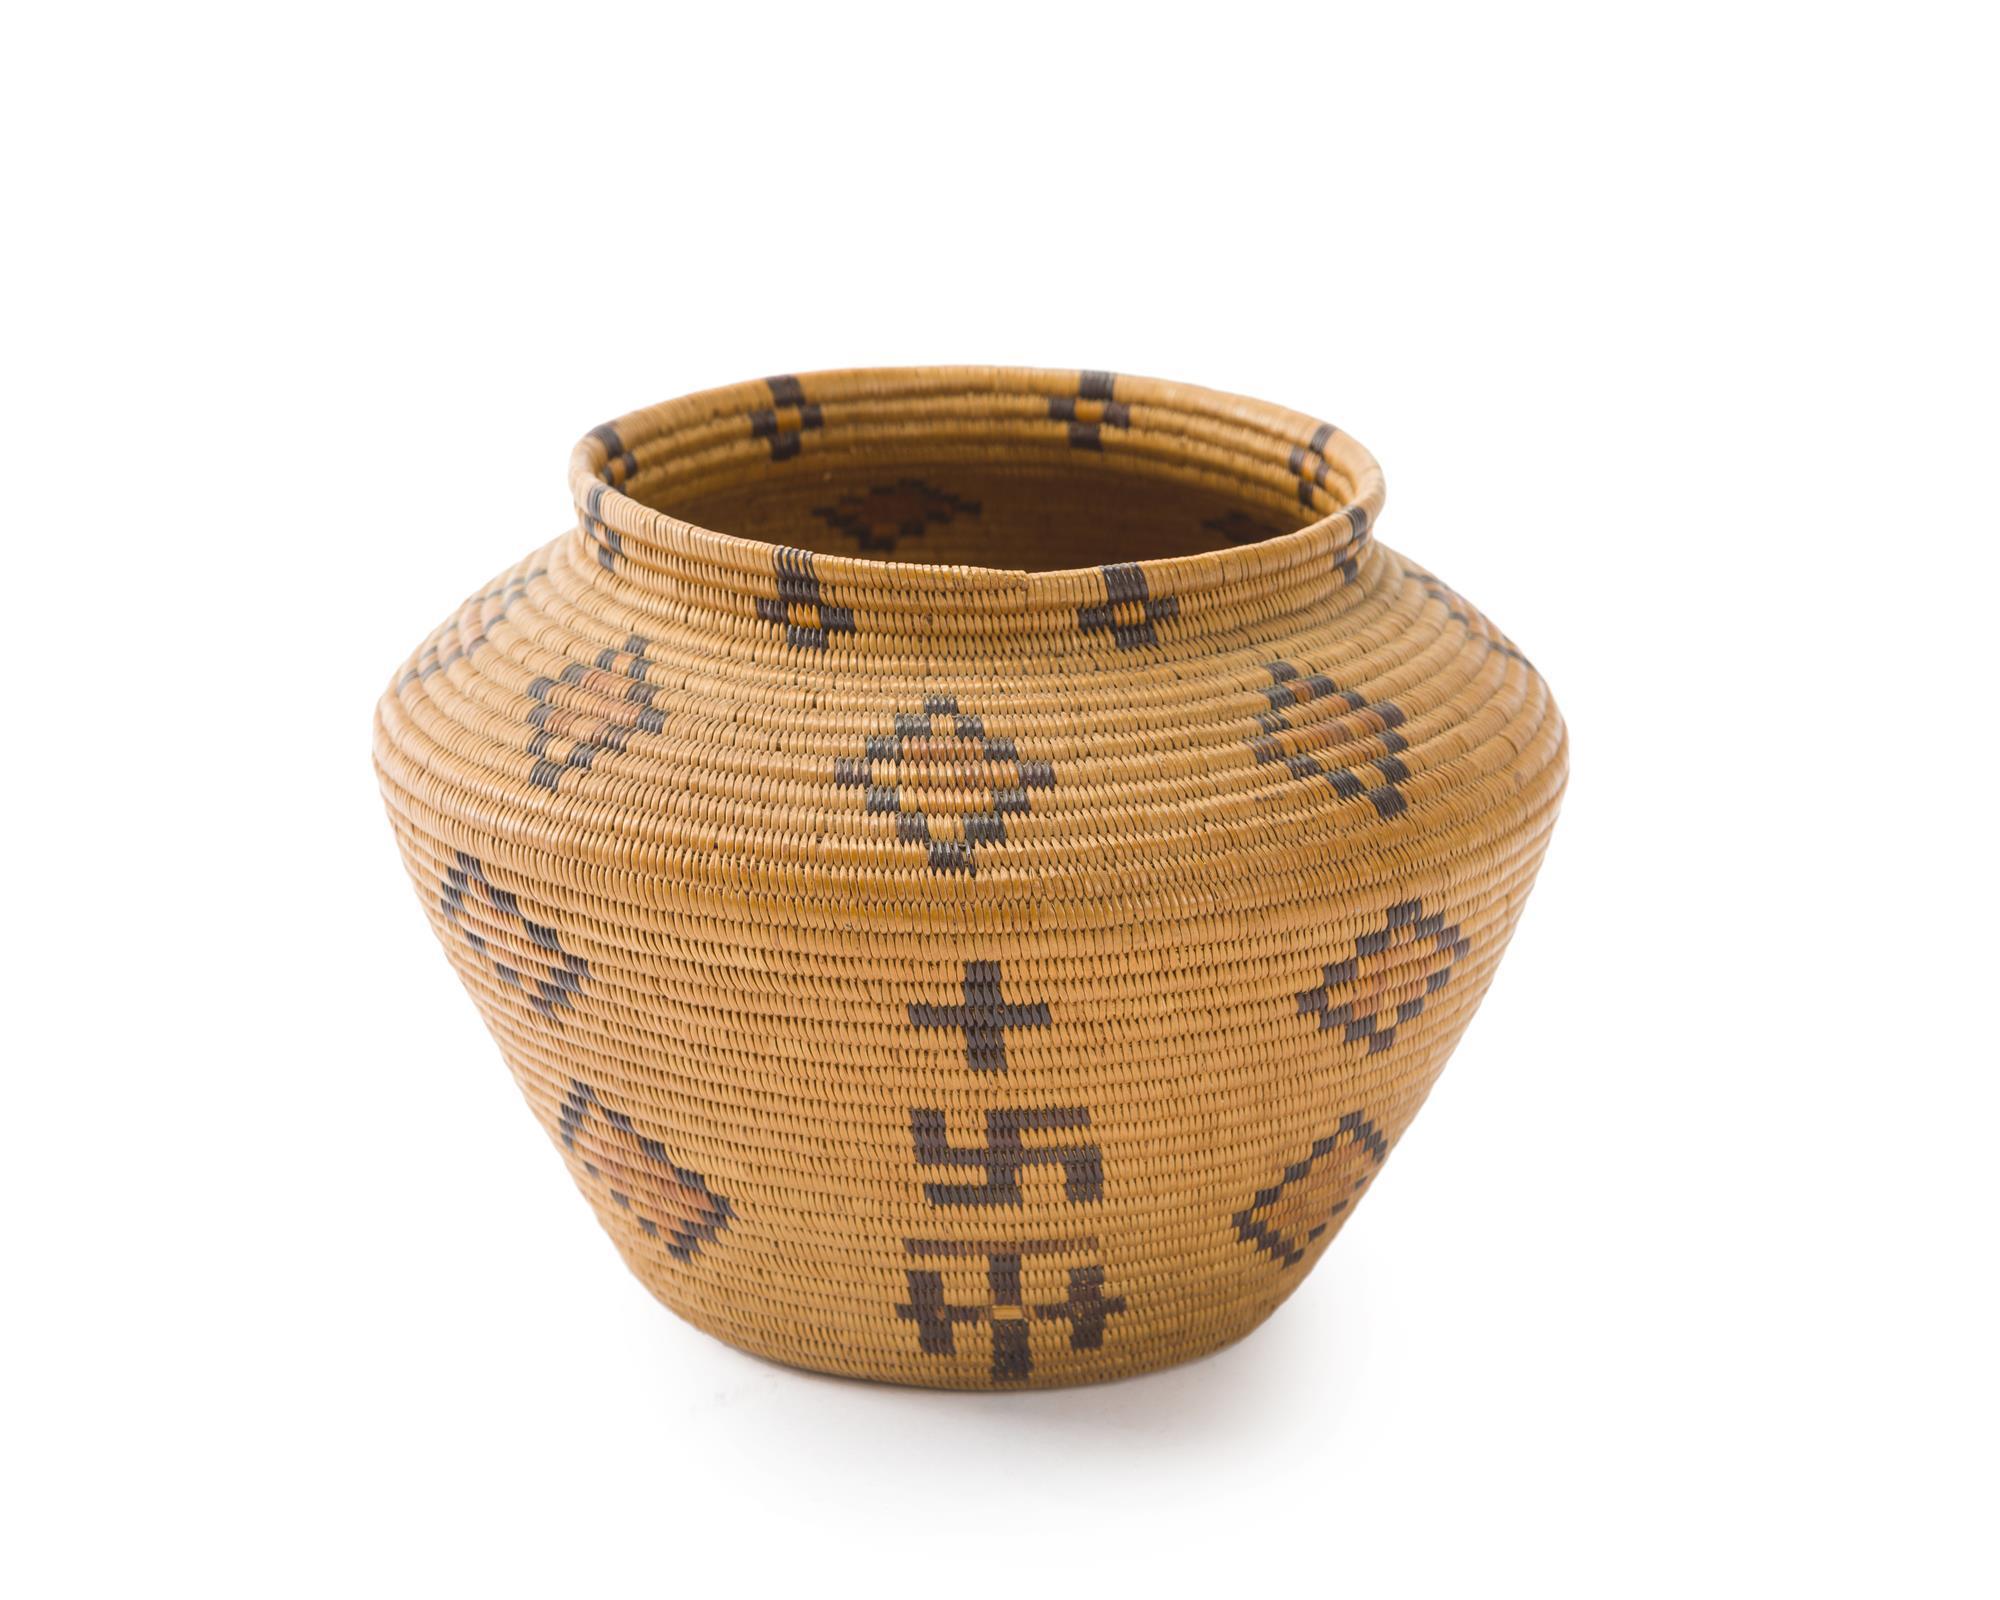 A polychrome Panamint basket